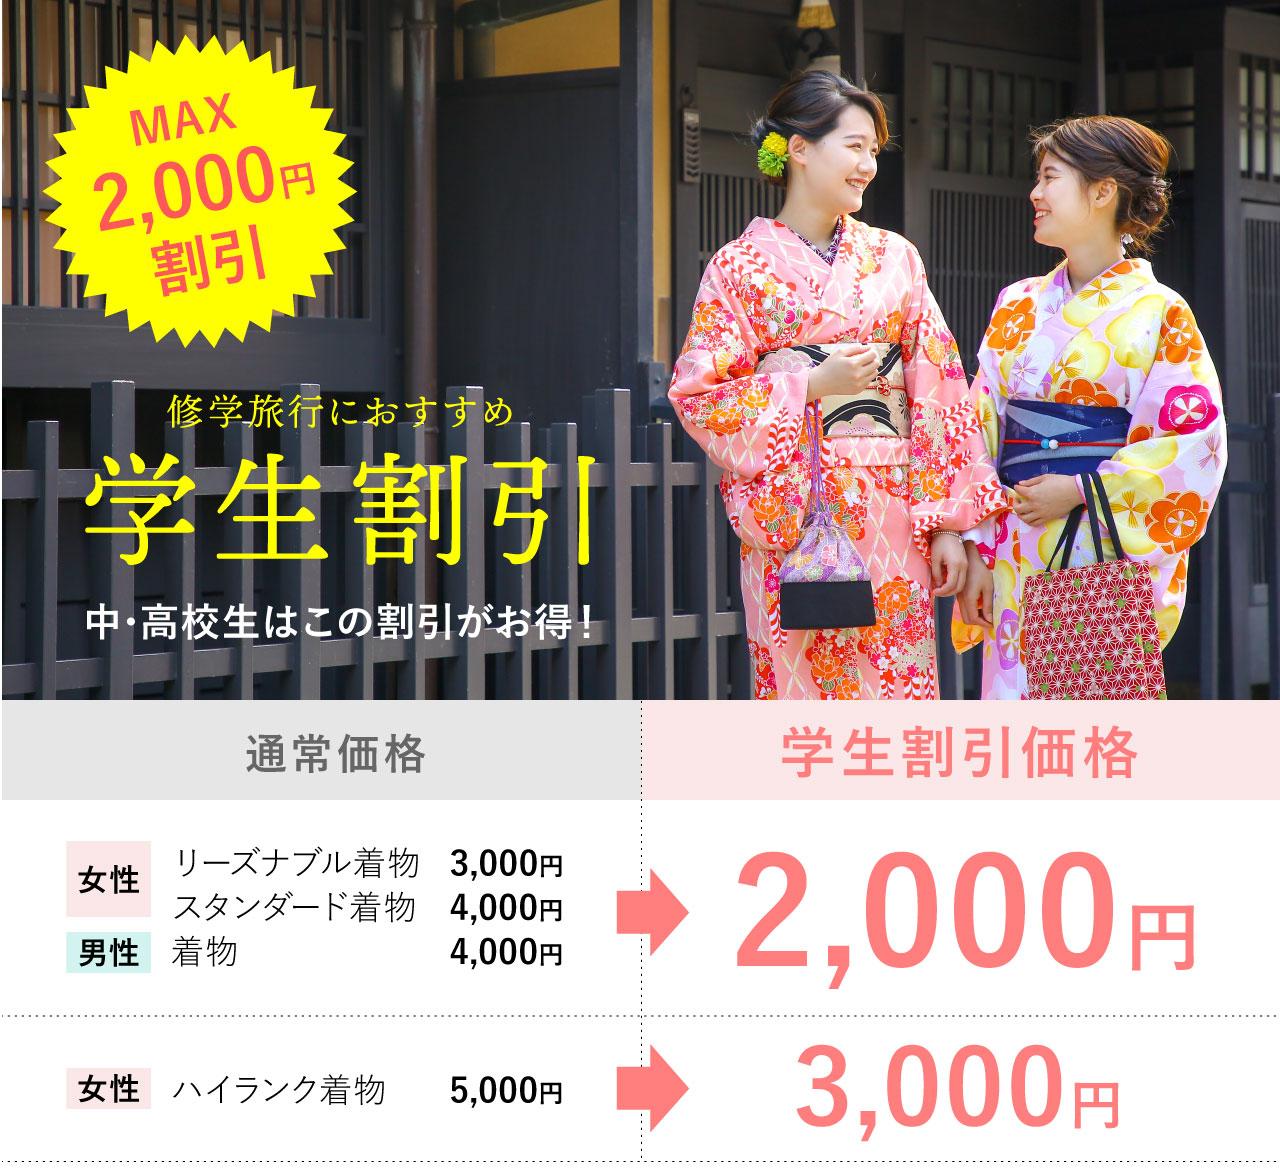 京都浅草 着物レンタル 京越 学生割引